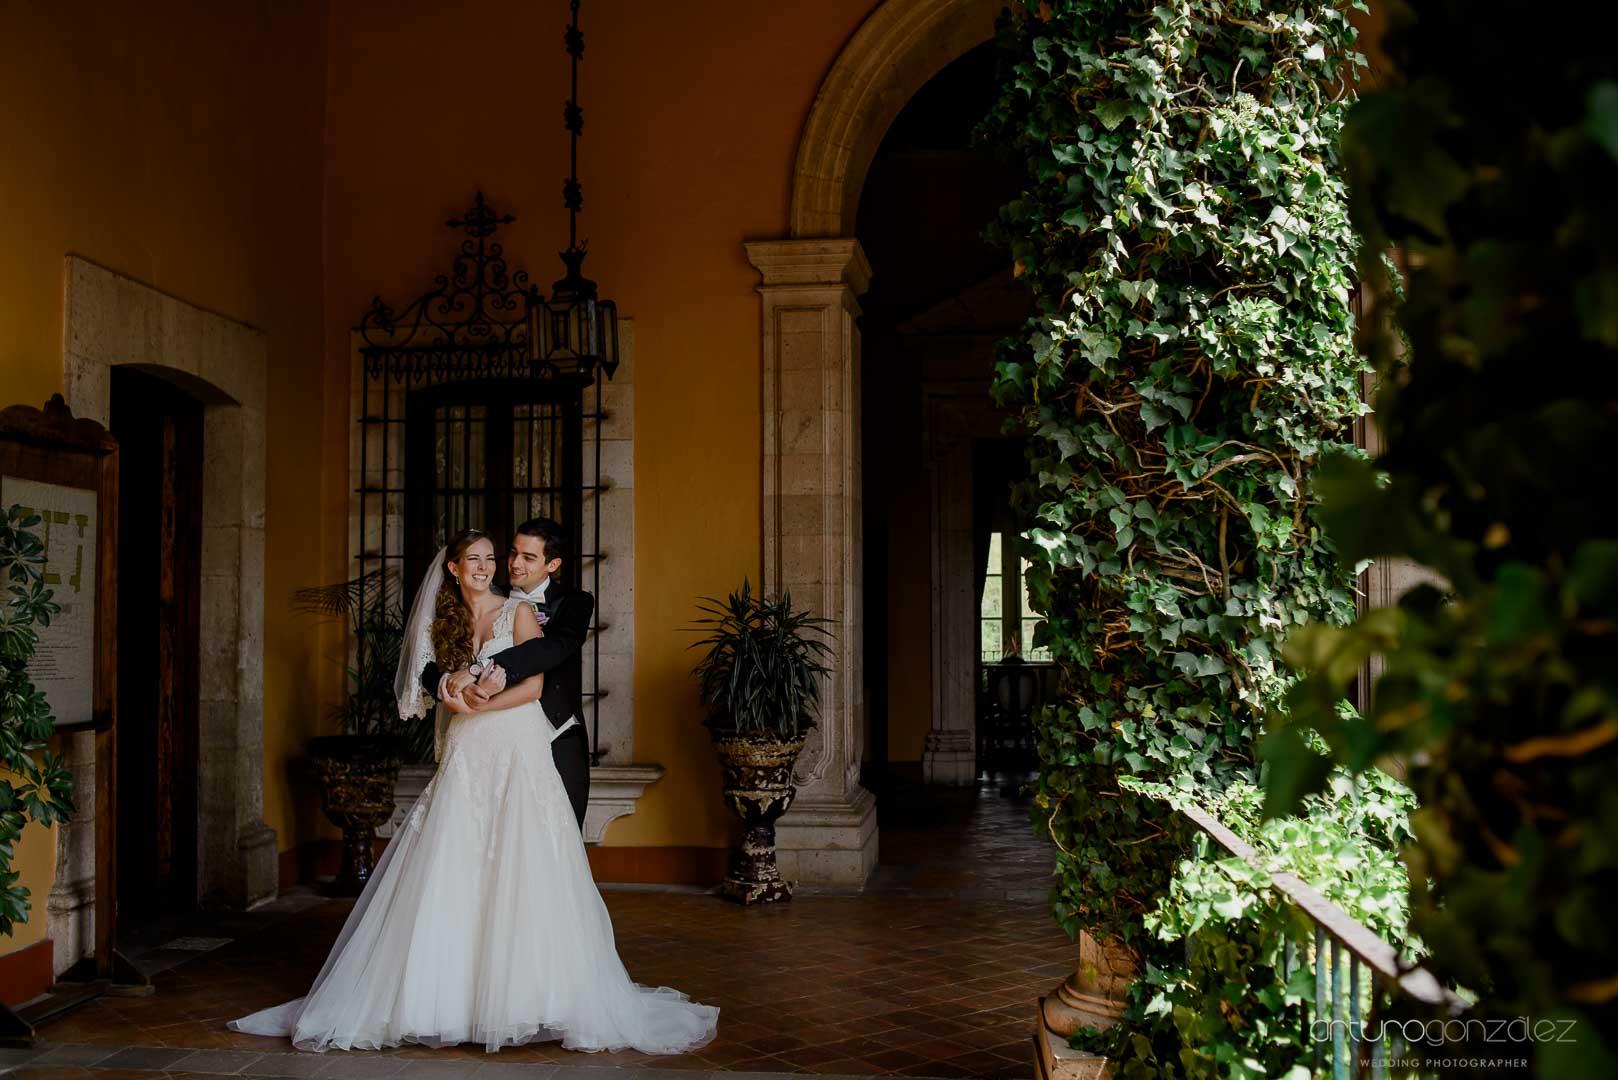 fotografo-de-bodas-en-guanajuato-34